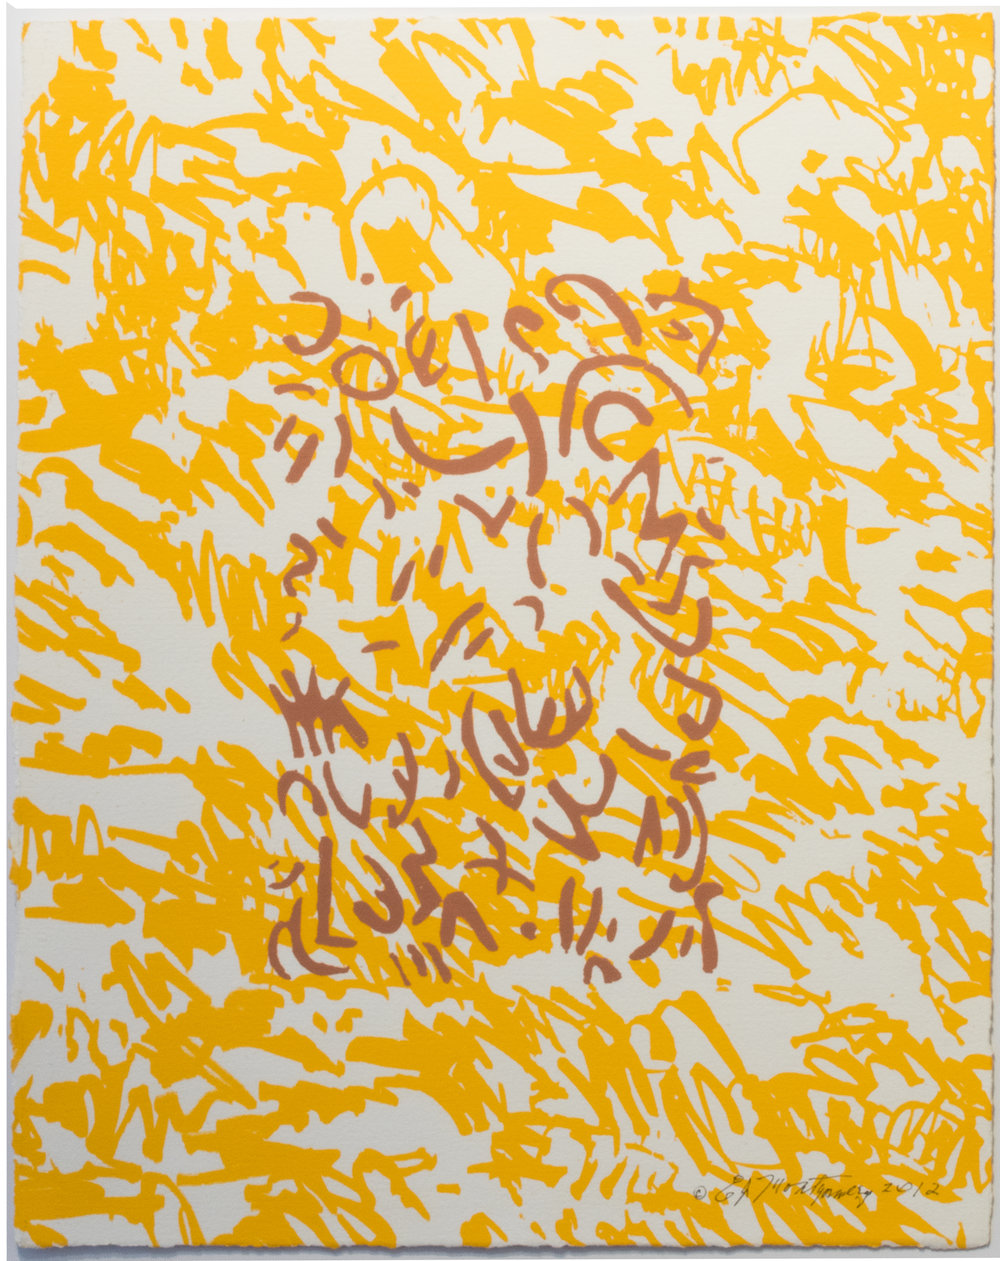 Language in Yellow